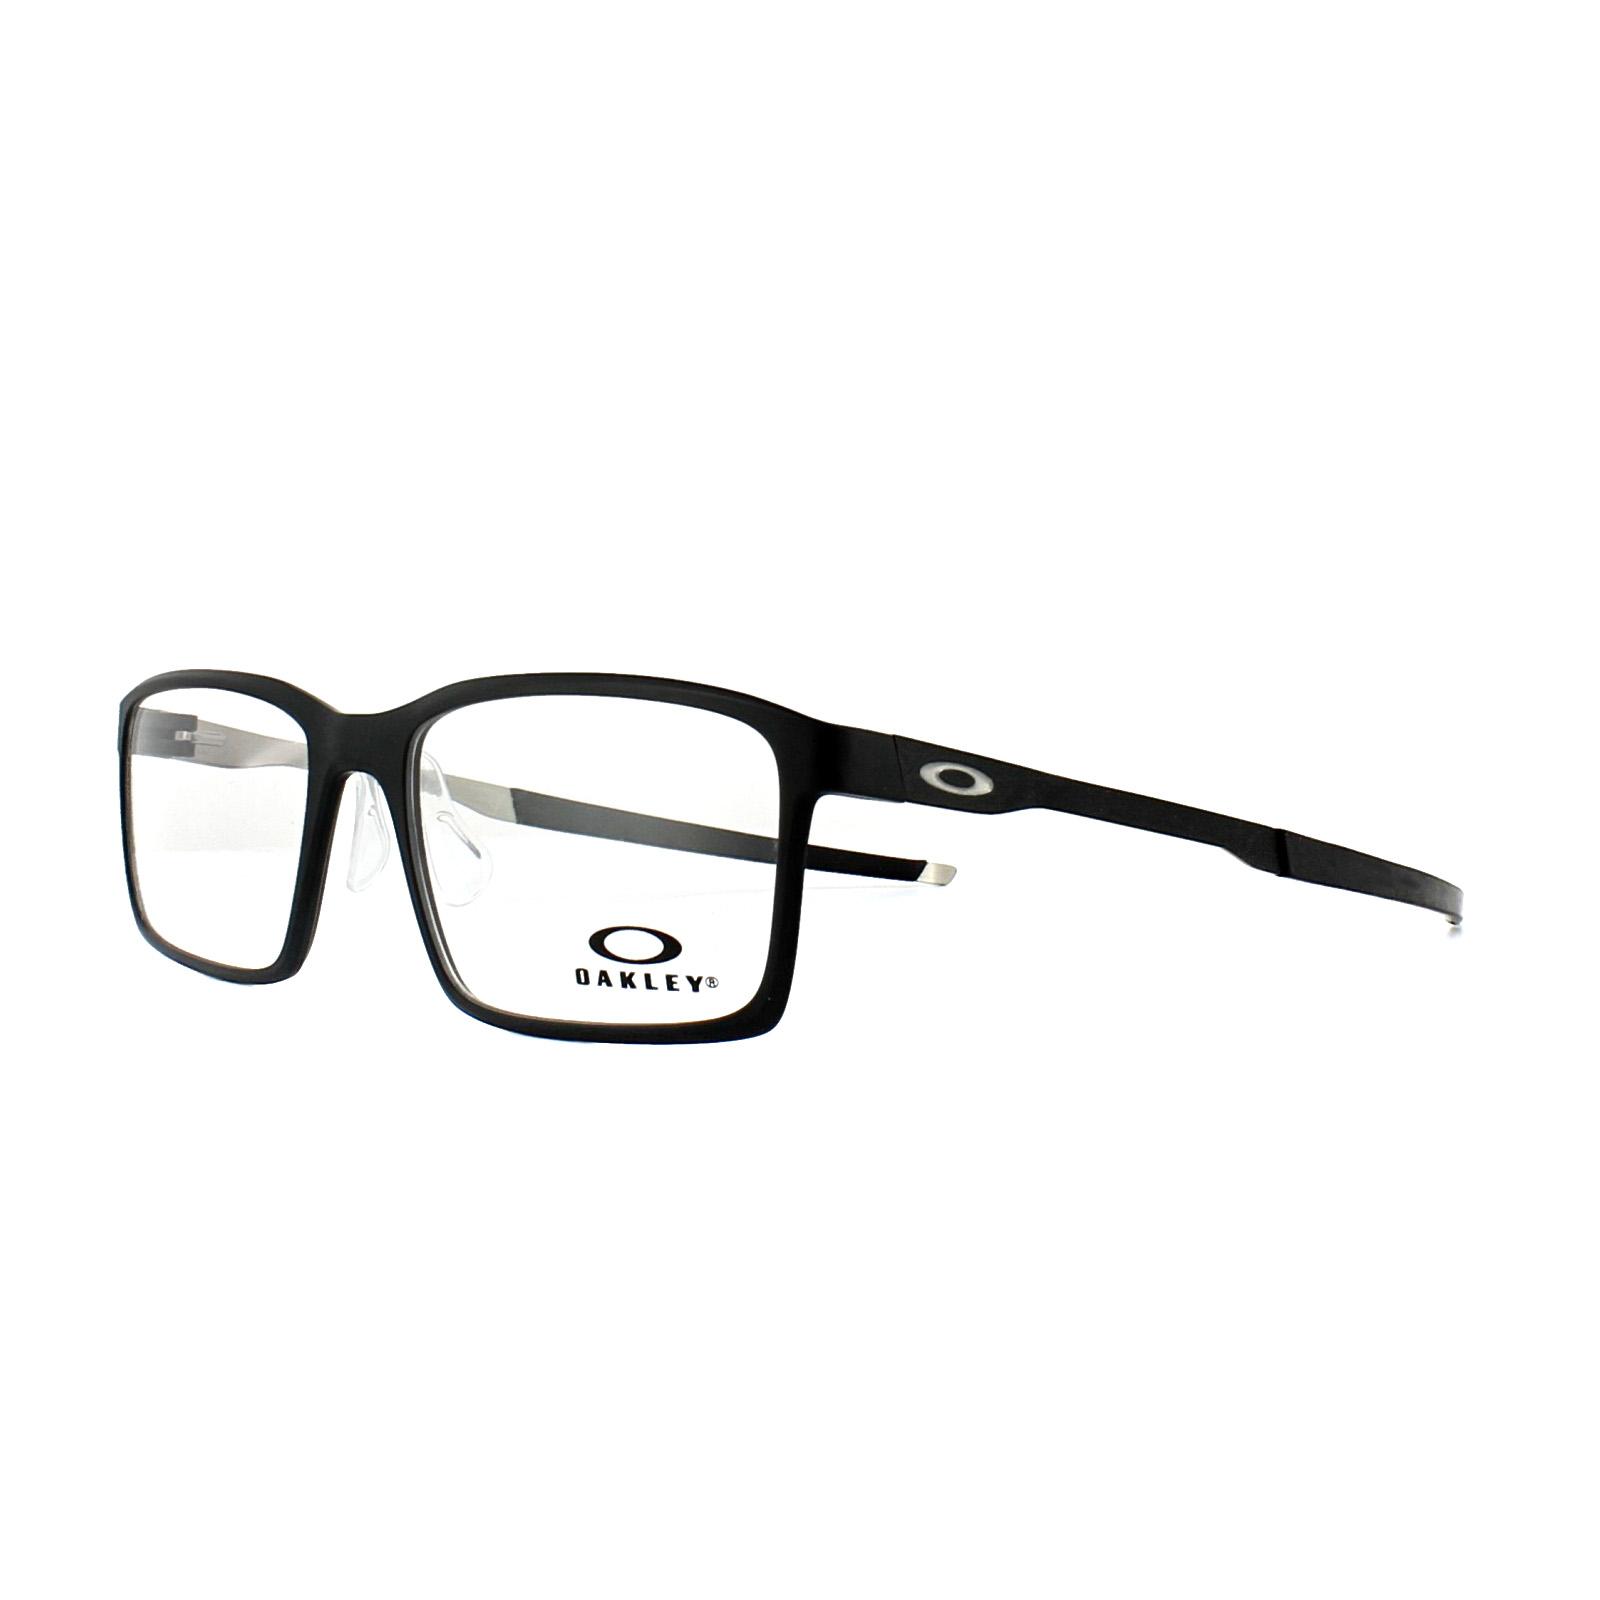 c8ae115fb6 Sentinel Oakley Glasses Frames Steel Line S OX8097-01 Satin Black 54mm Mens